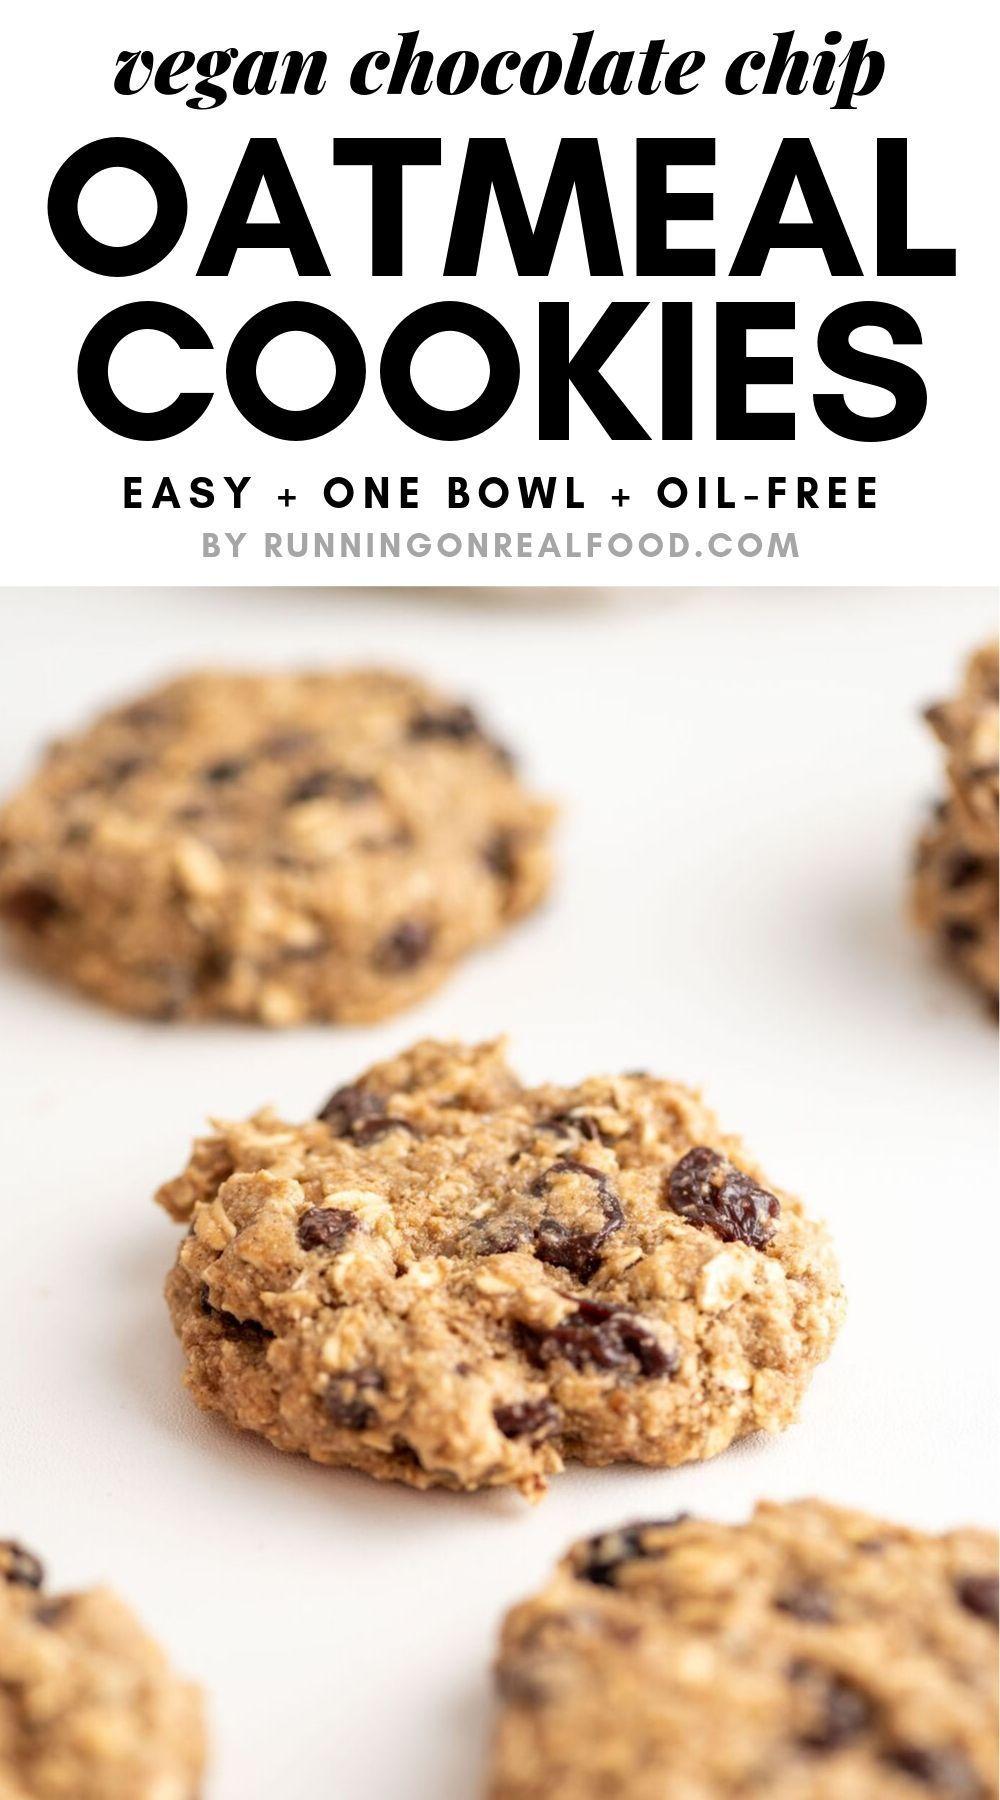 Vegan Oatmeal Raisin Chocolate Chip Cookies Recipe Oatmeal Raisin Chocolate Chip Cookies Healthy Oatmeal Cookies Vegan Oatmeal